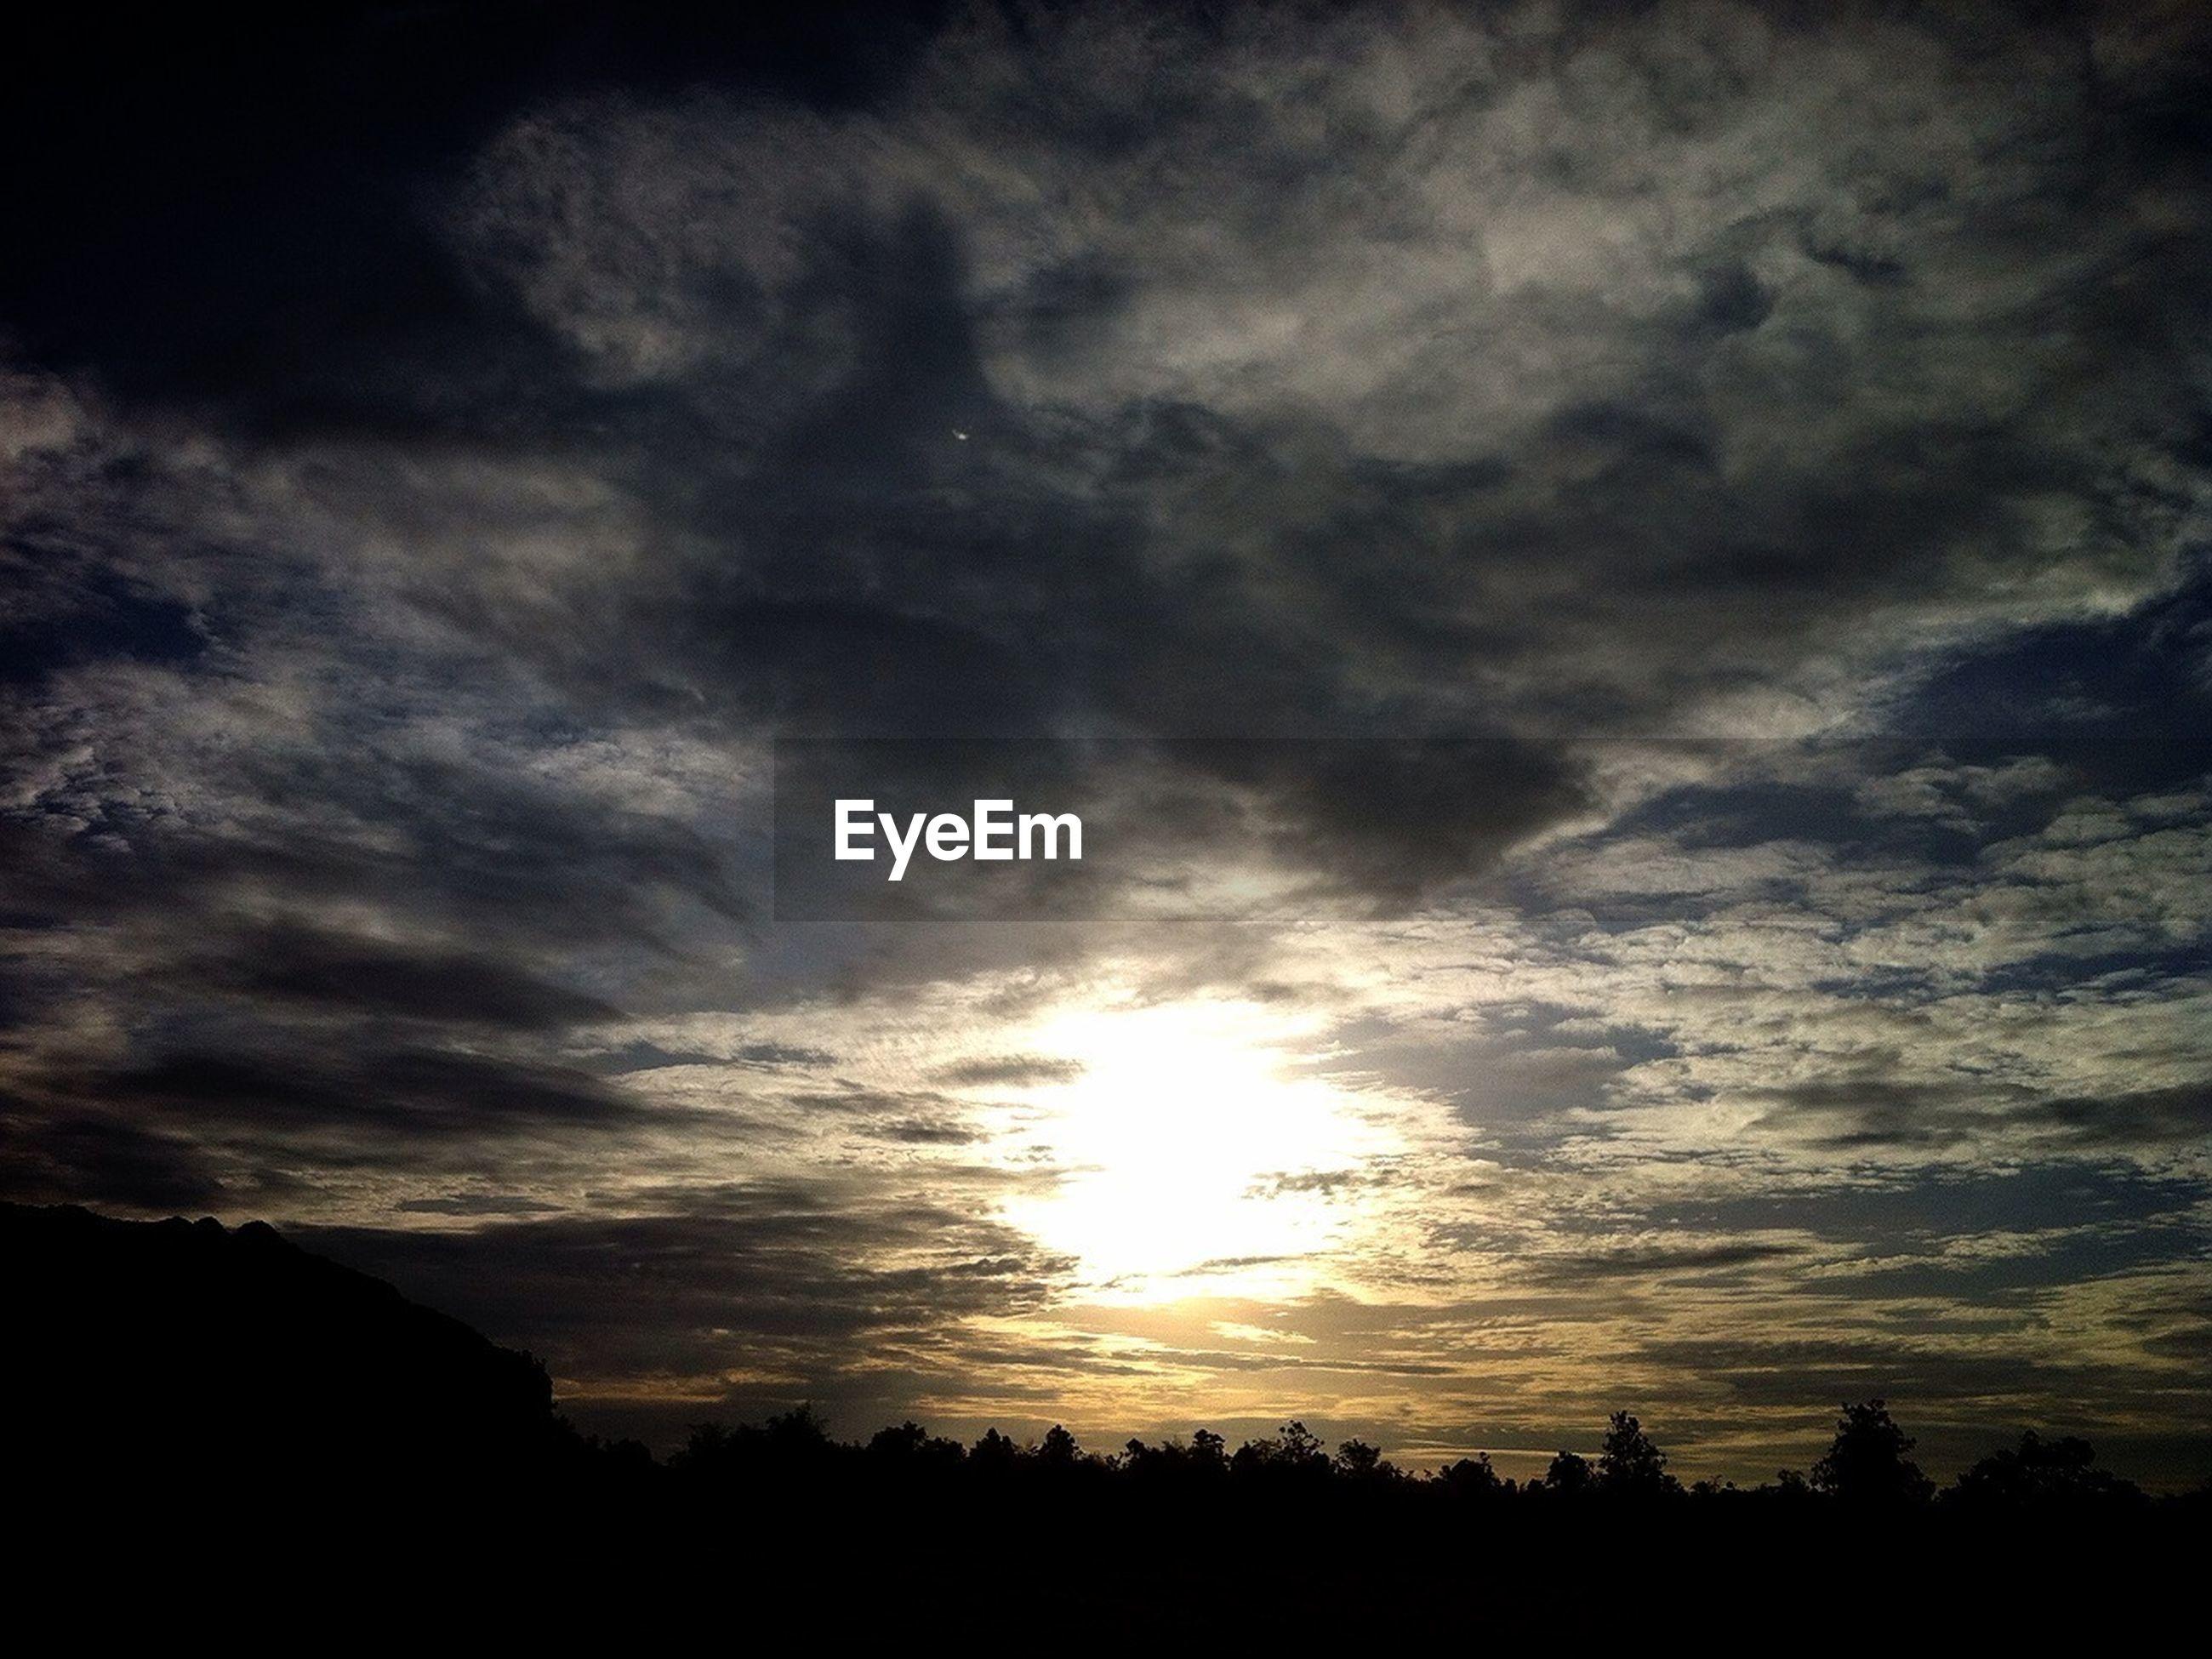 silhouette, sky, sunset, beauty in nature, cloud - sky, tranquil scene, scenics, tranquility, nature, cloudy, sun, cloud, landscape, tree, idyllic, low angle view, sunlight, dramatic sky, dark, outdoors